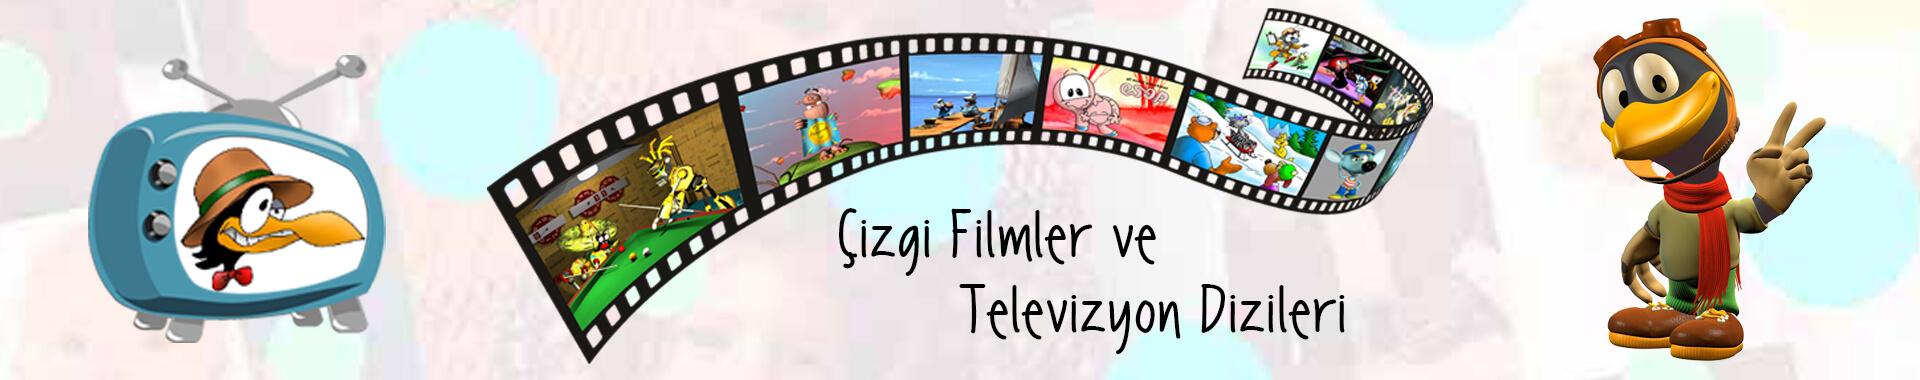 slide-tv-series-02-tr